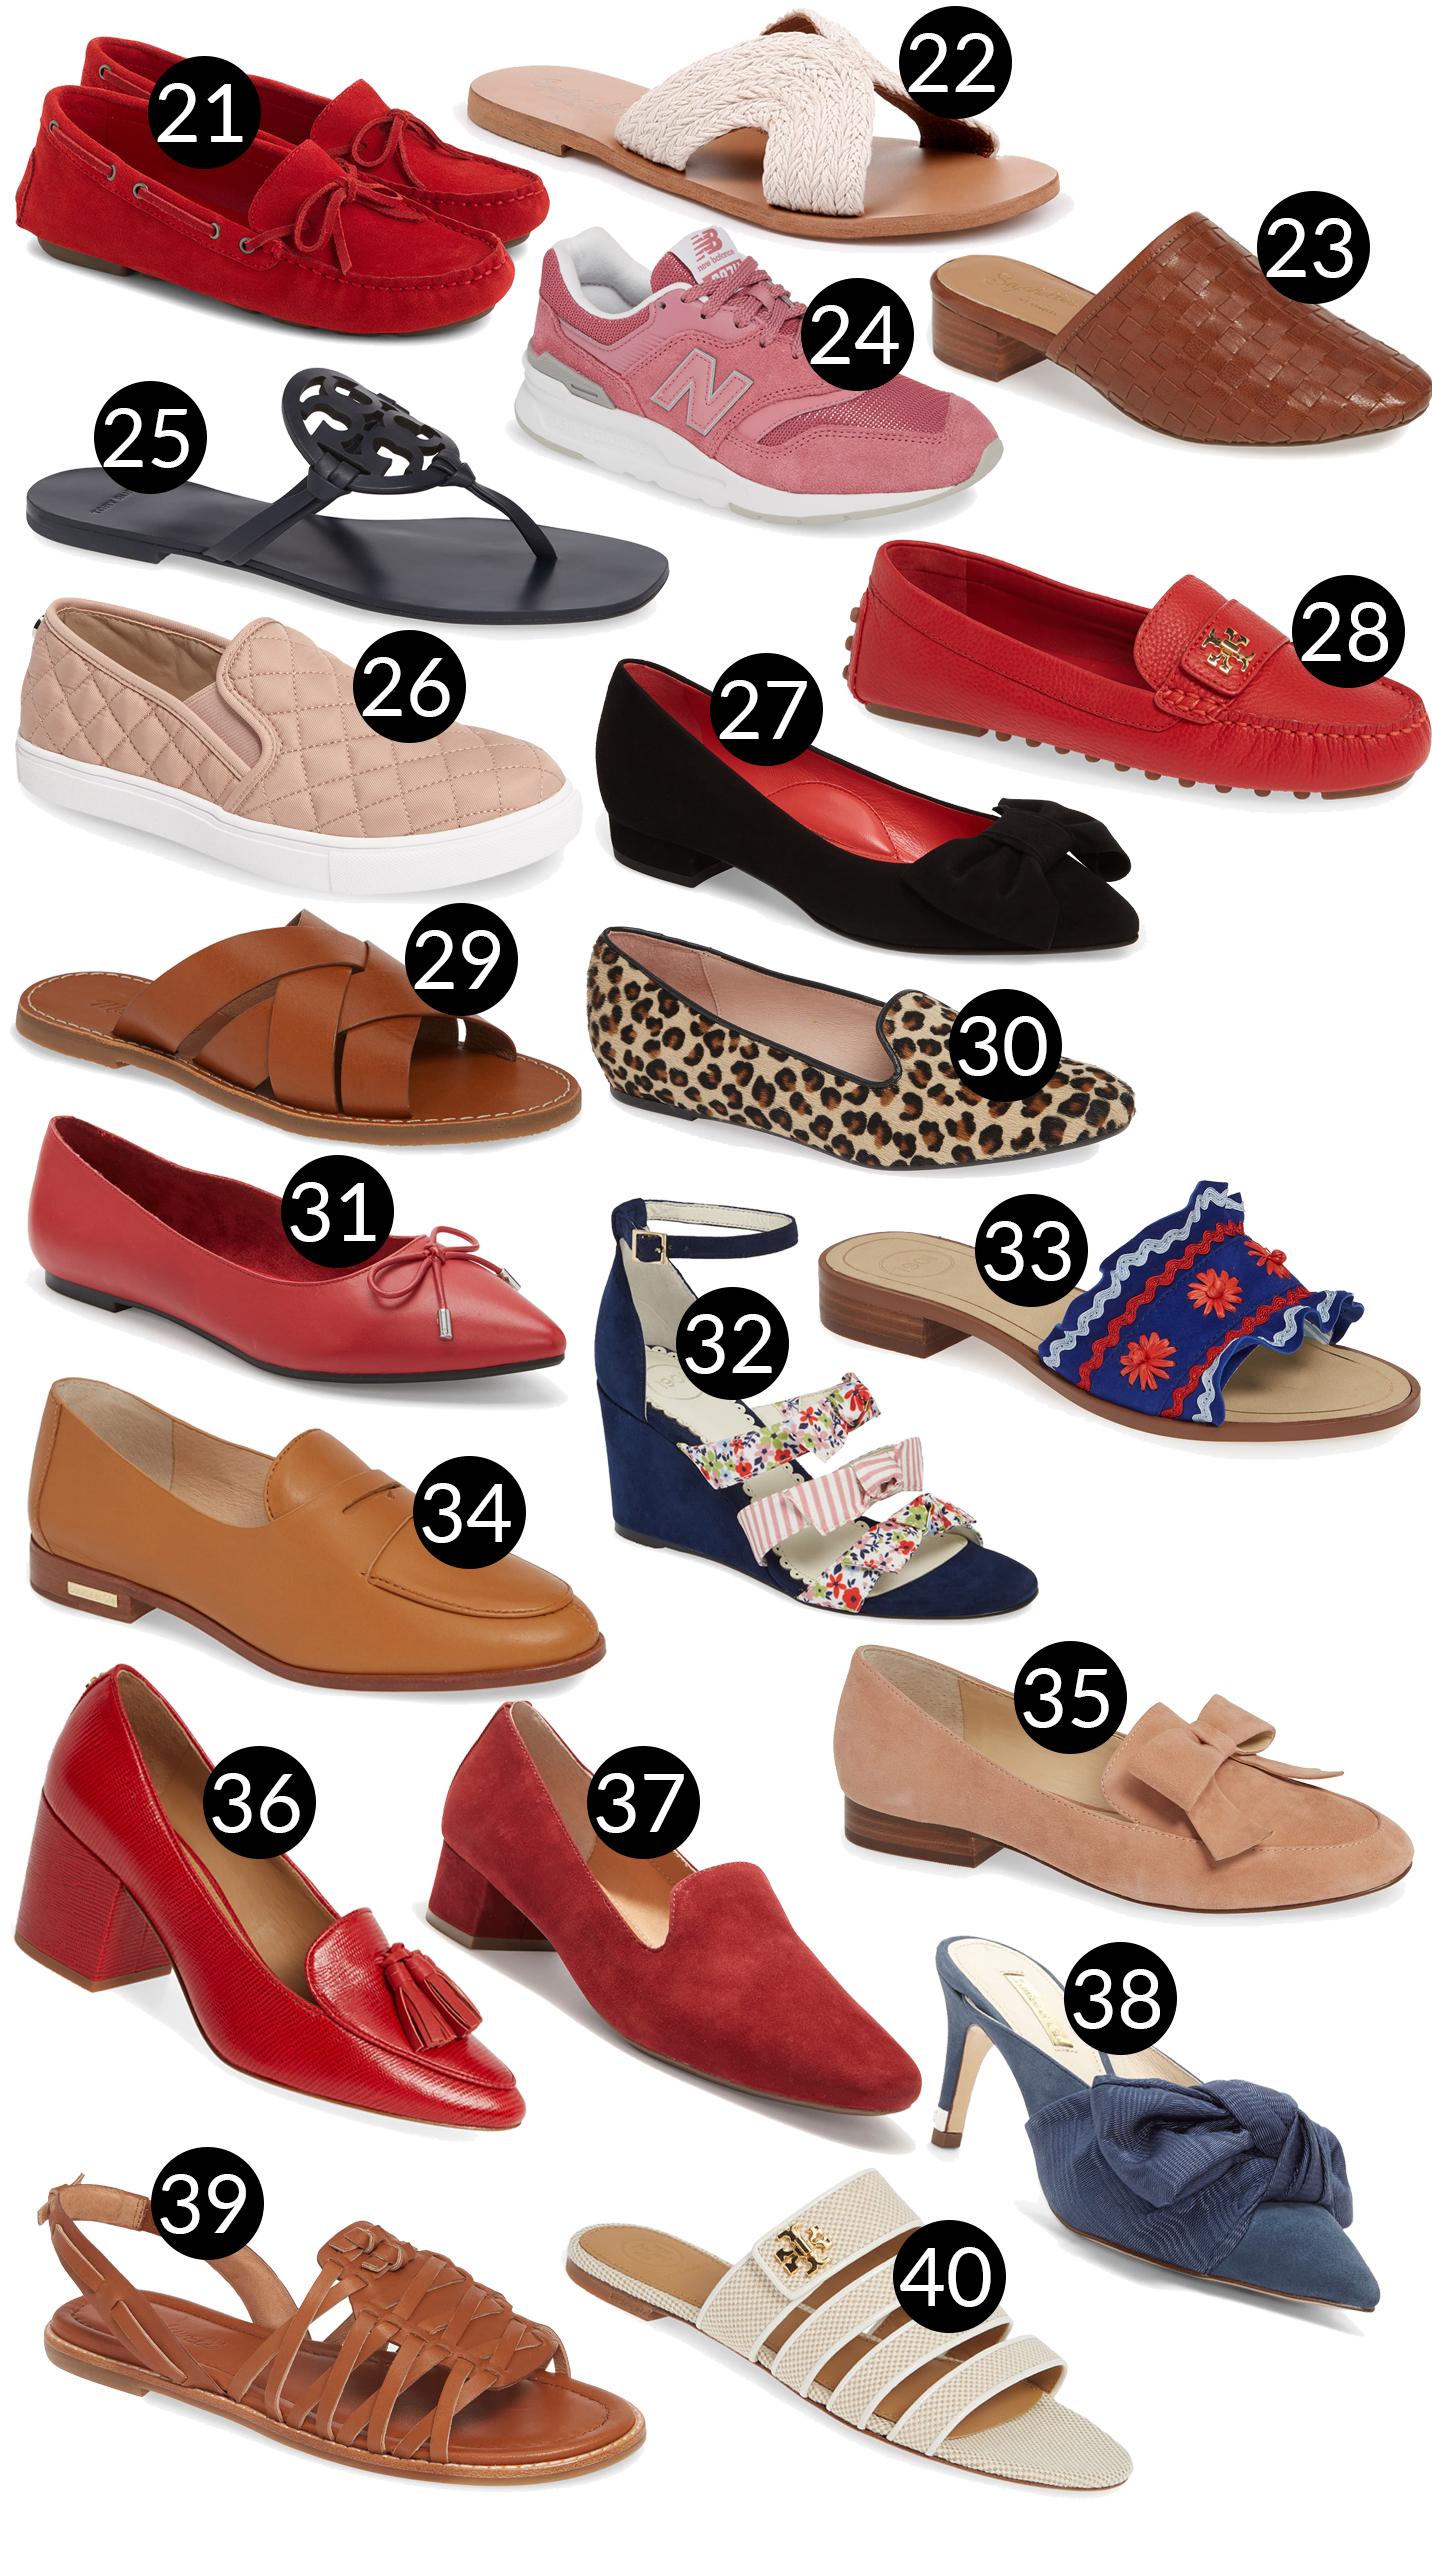 Memorial Day Weekend Preppy Sales -Nordstrom Shoes (Half-Yearly Sale)